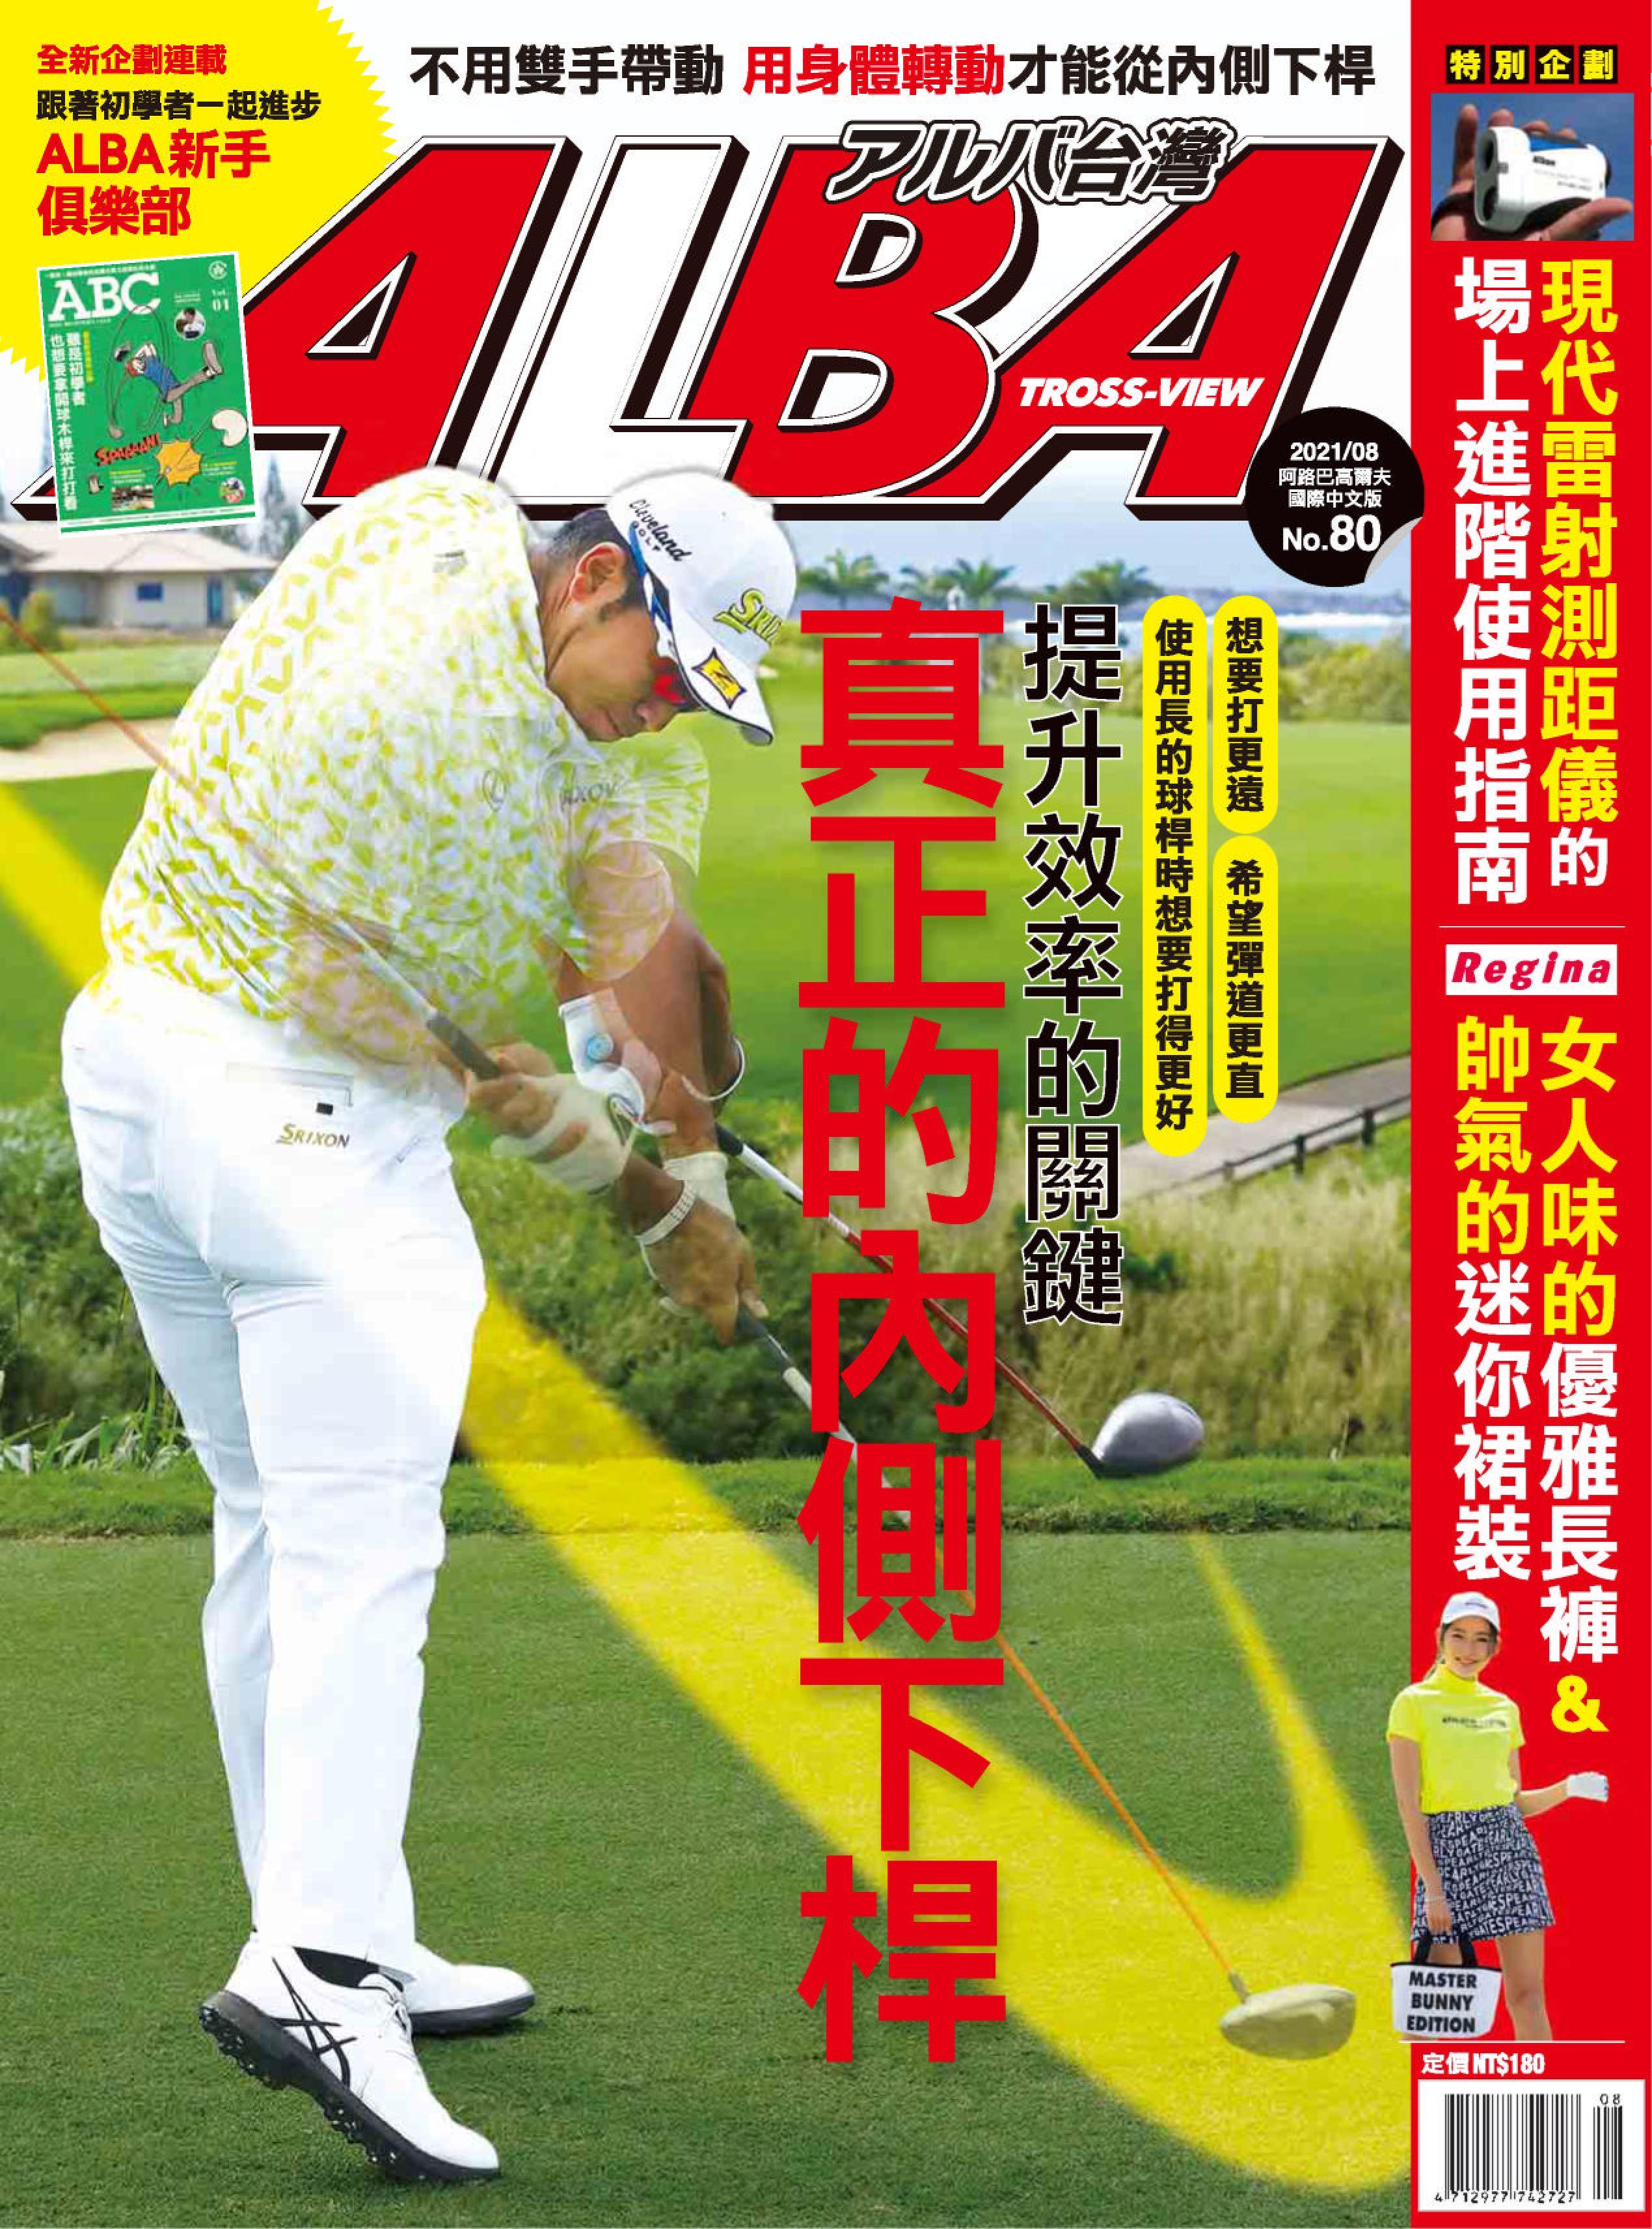 Alba Tross-View 阿路巴高爾夫 國際中文版 - 八月 2021